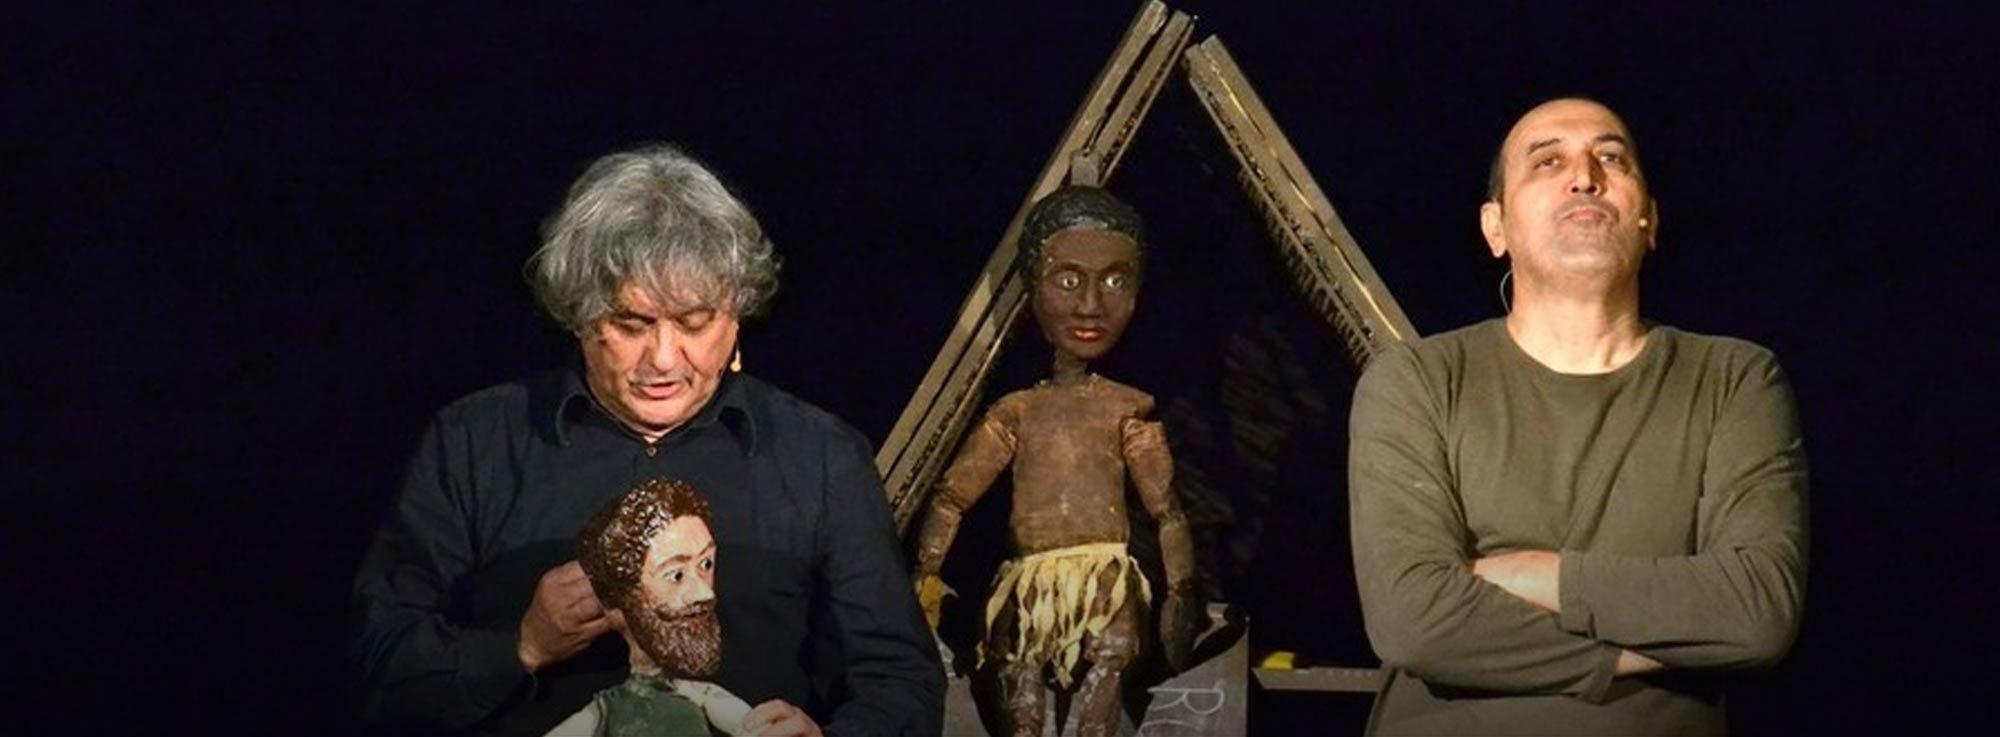 Taranto: Robinson Crusoe